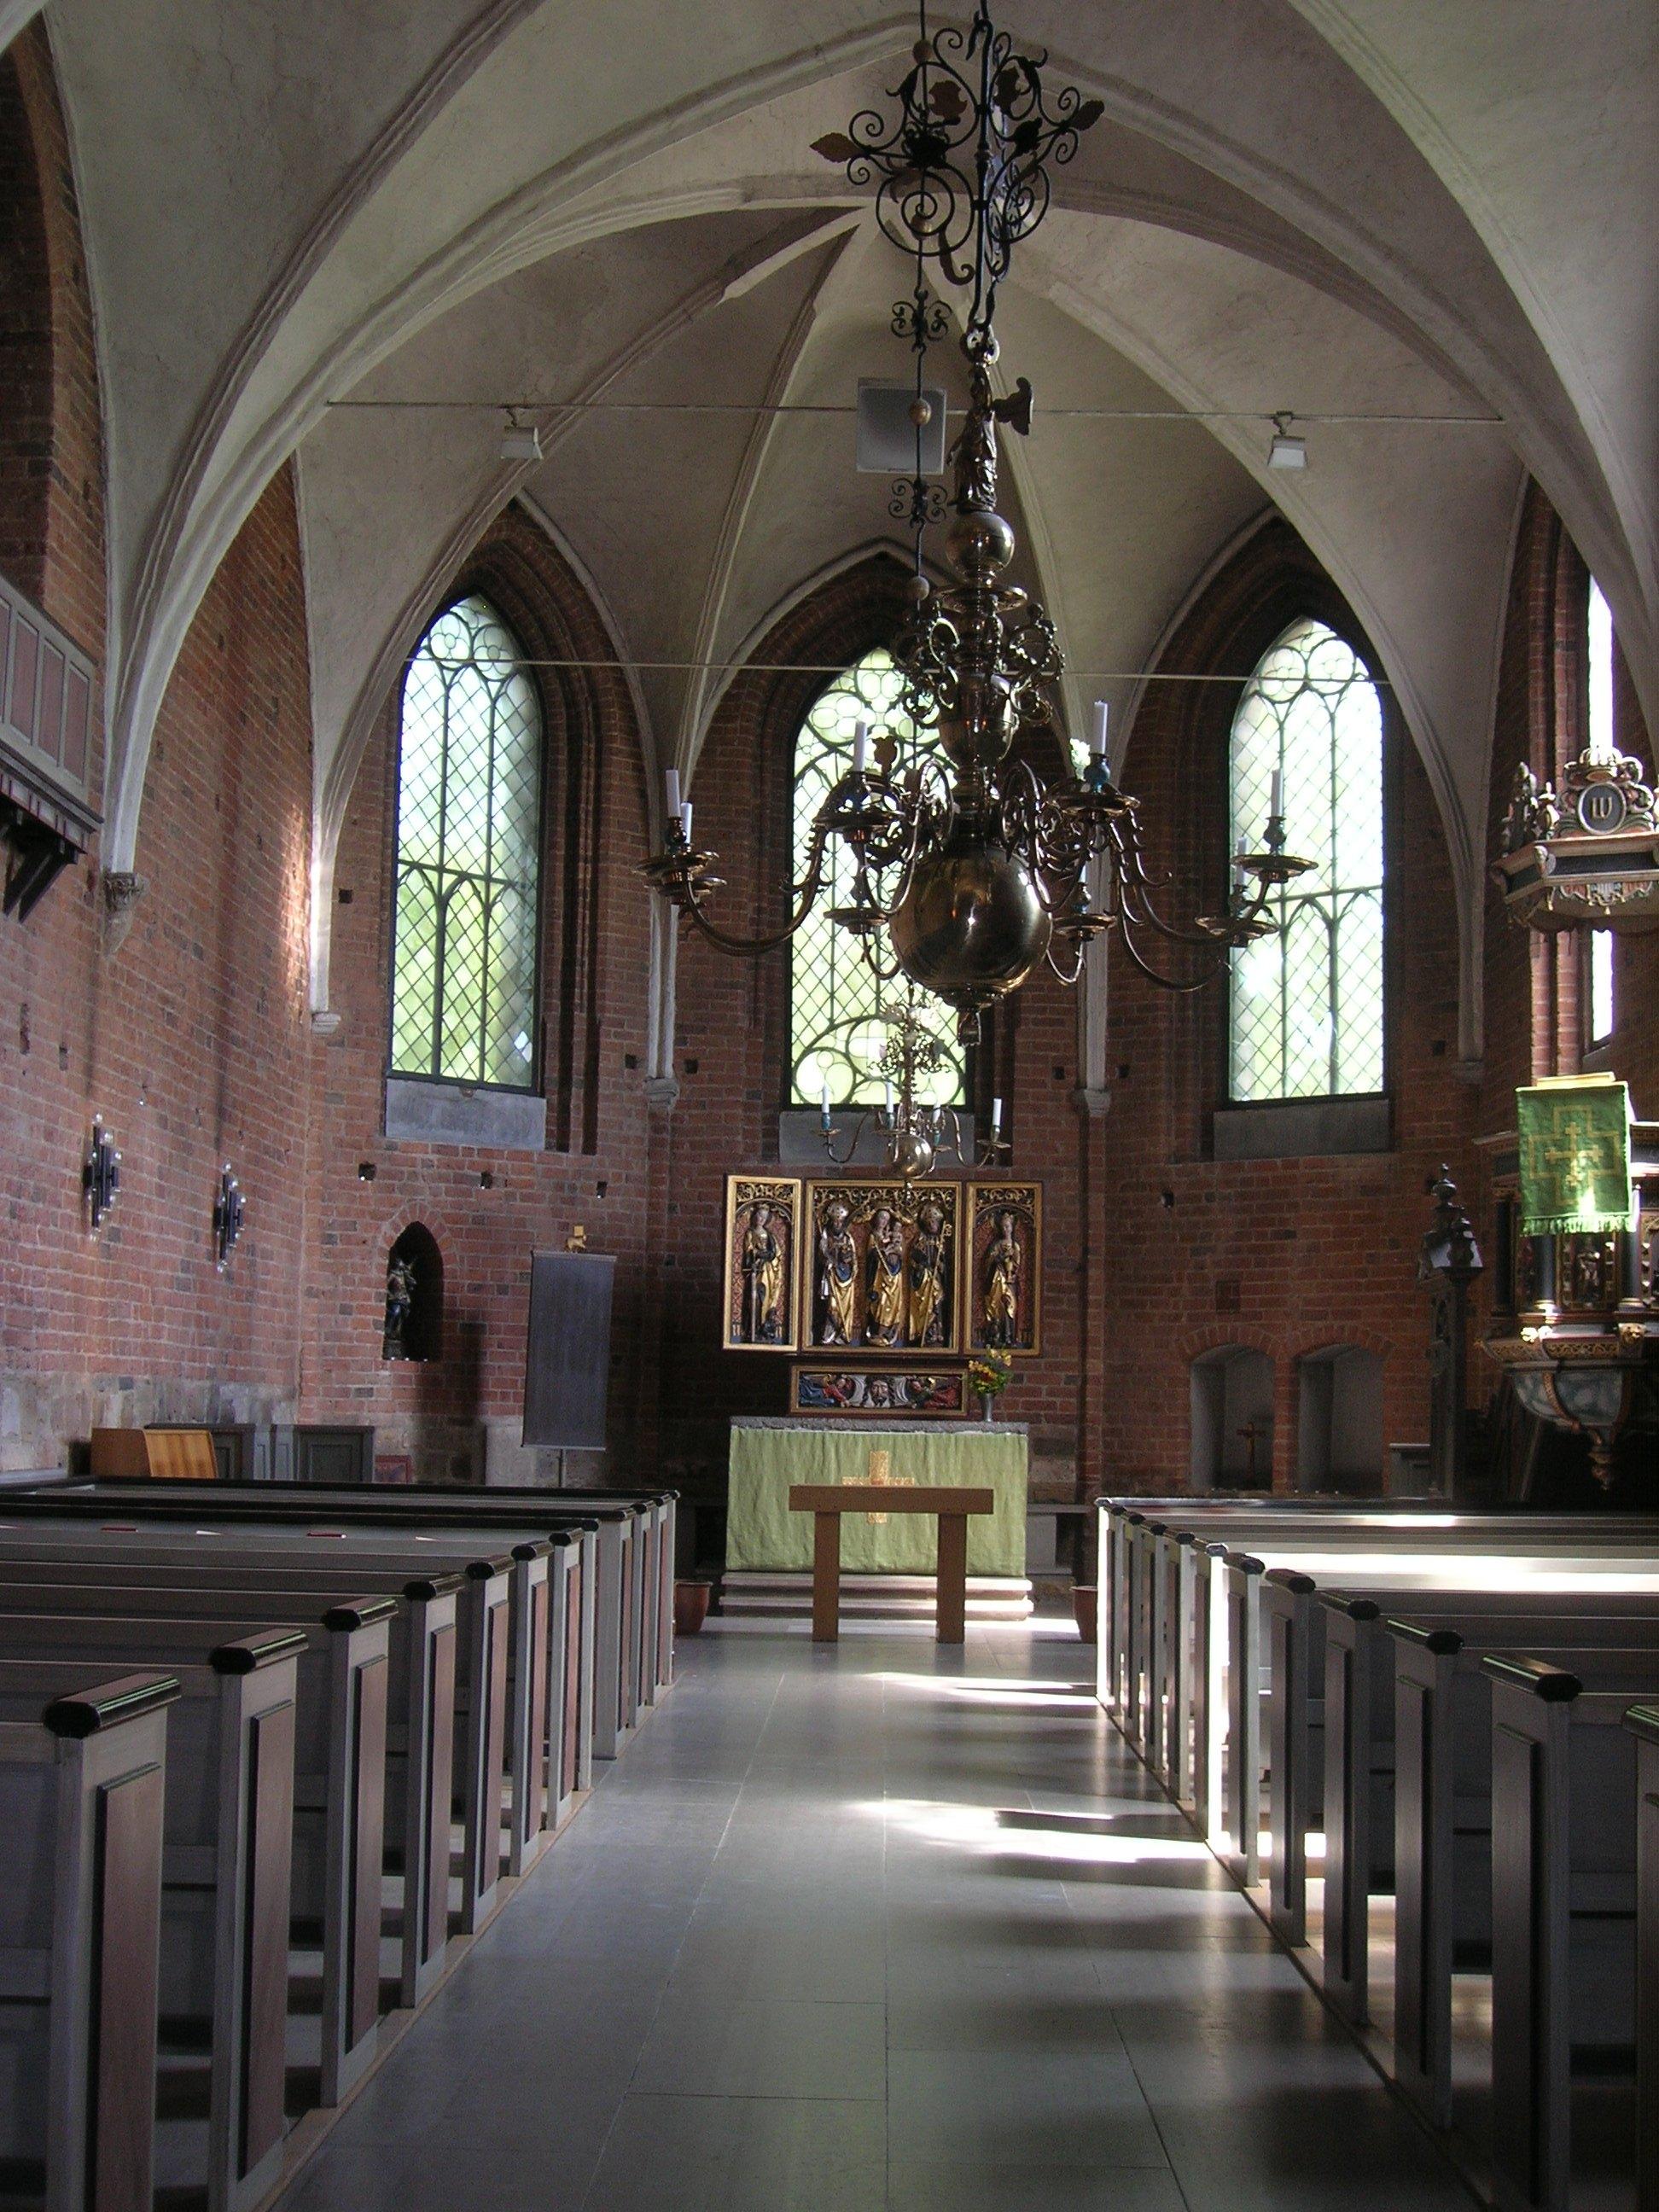 Sankt Peters klosters kyrka